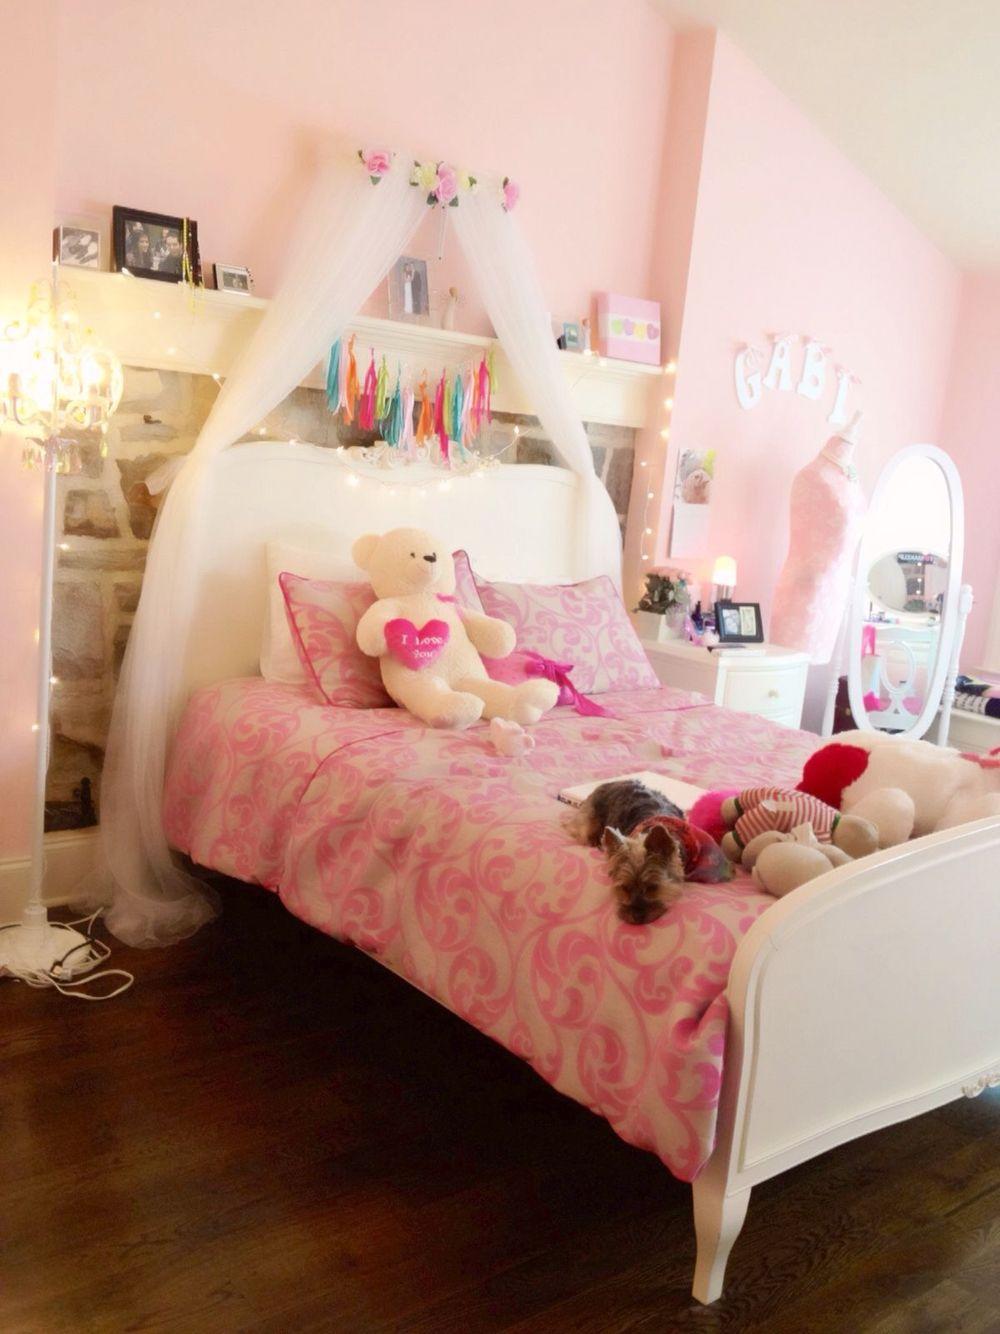 gabriella demartino room | ♡ my dream house ♡ | pinterest | room